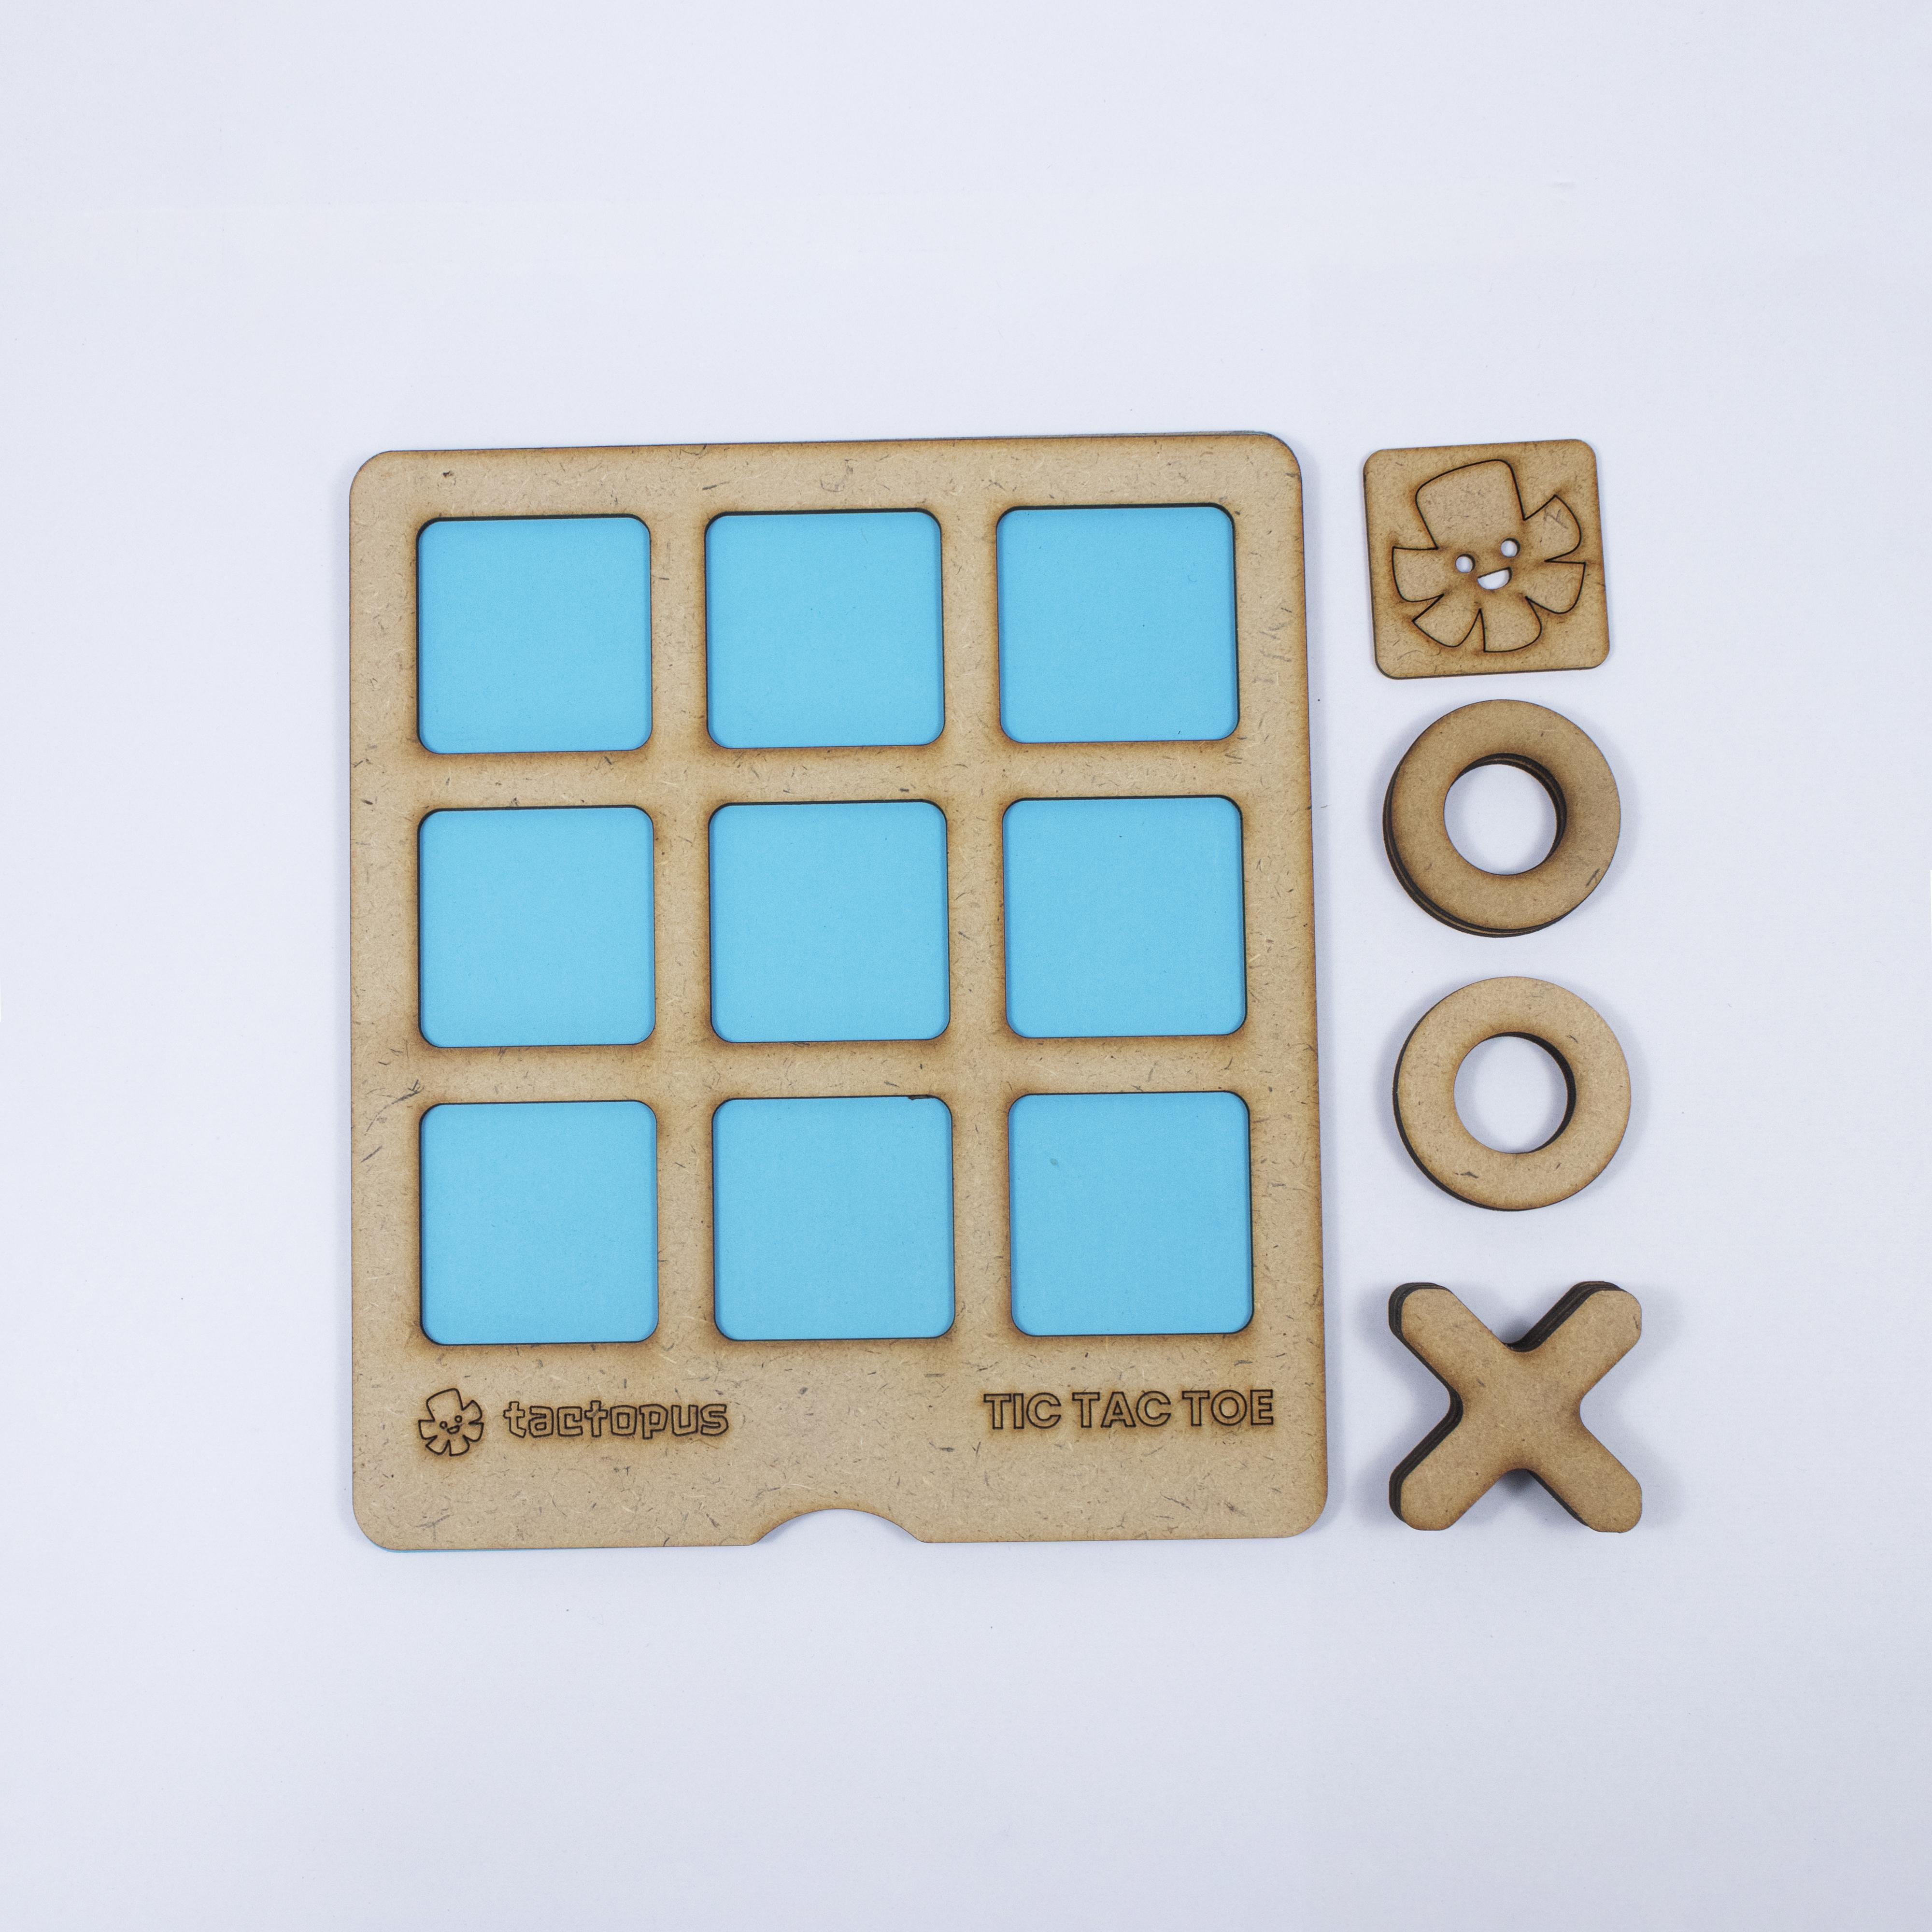 Tic-Tac-Toe Game Board